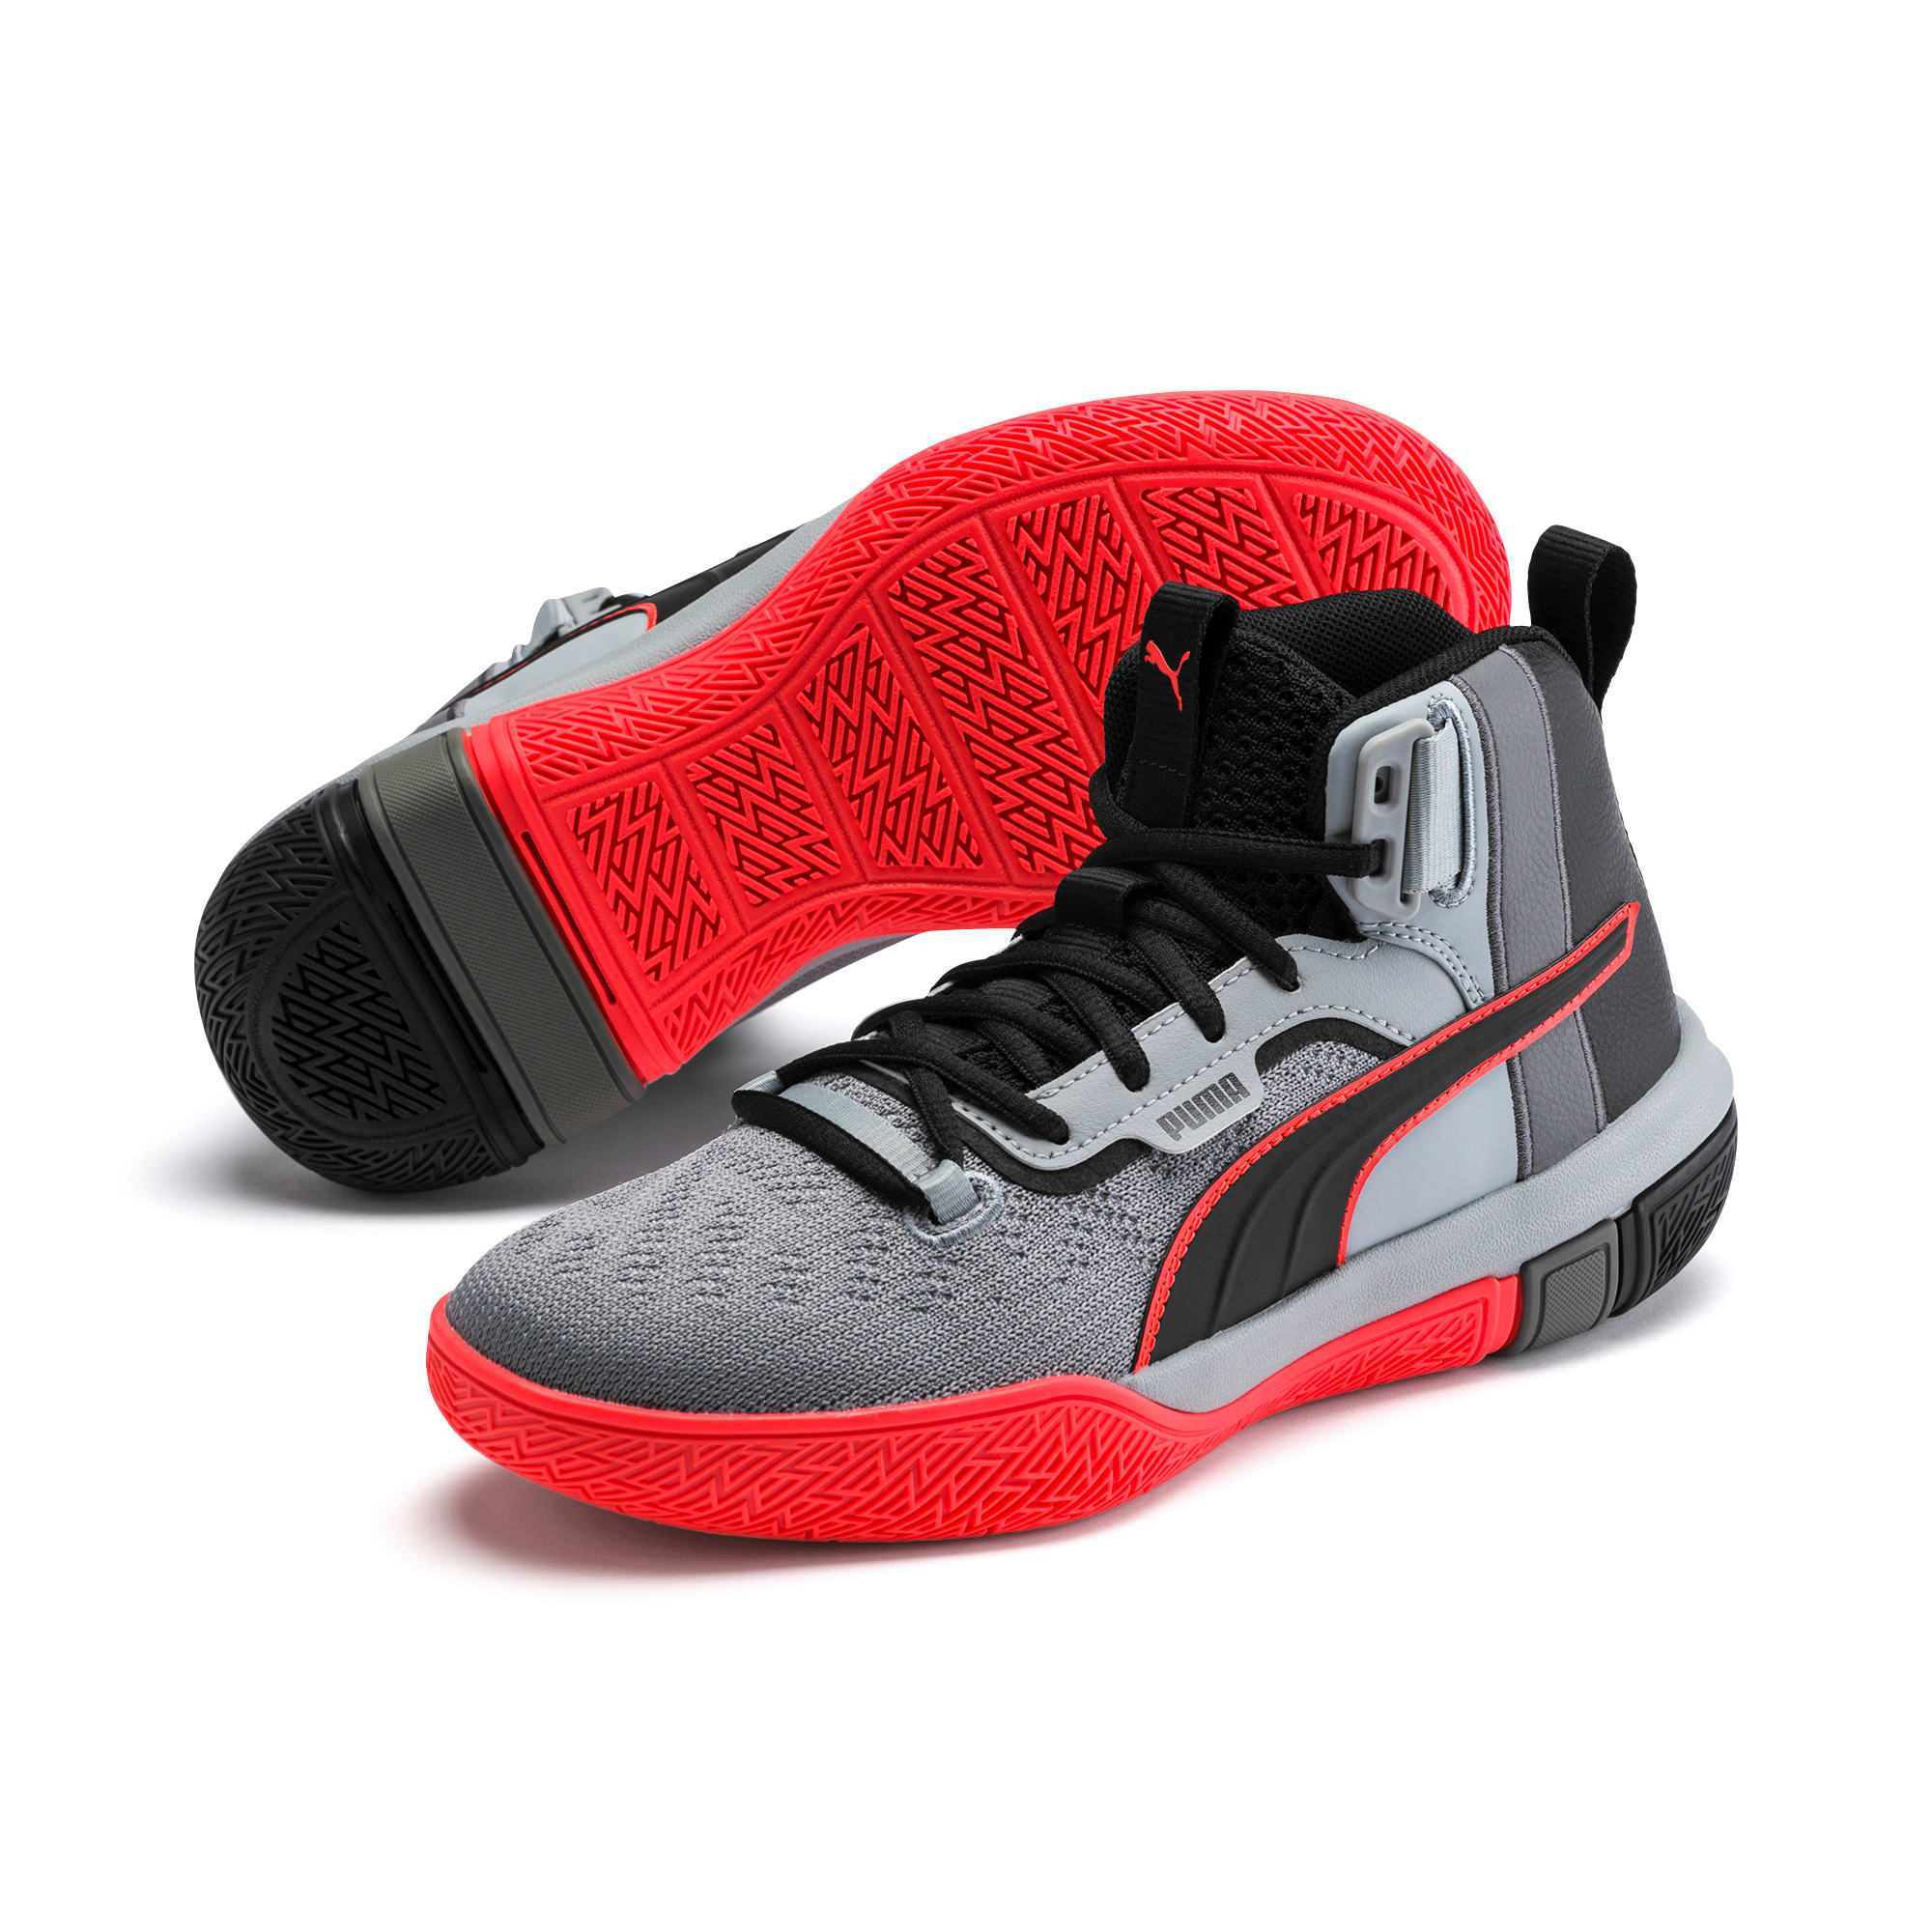 Thumbnail 2 of Legacy Disrupt Basketball Shoes JR, Puma Black-Red Blast, medium